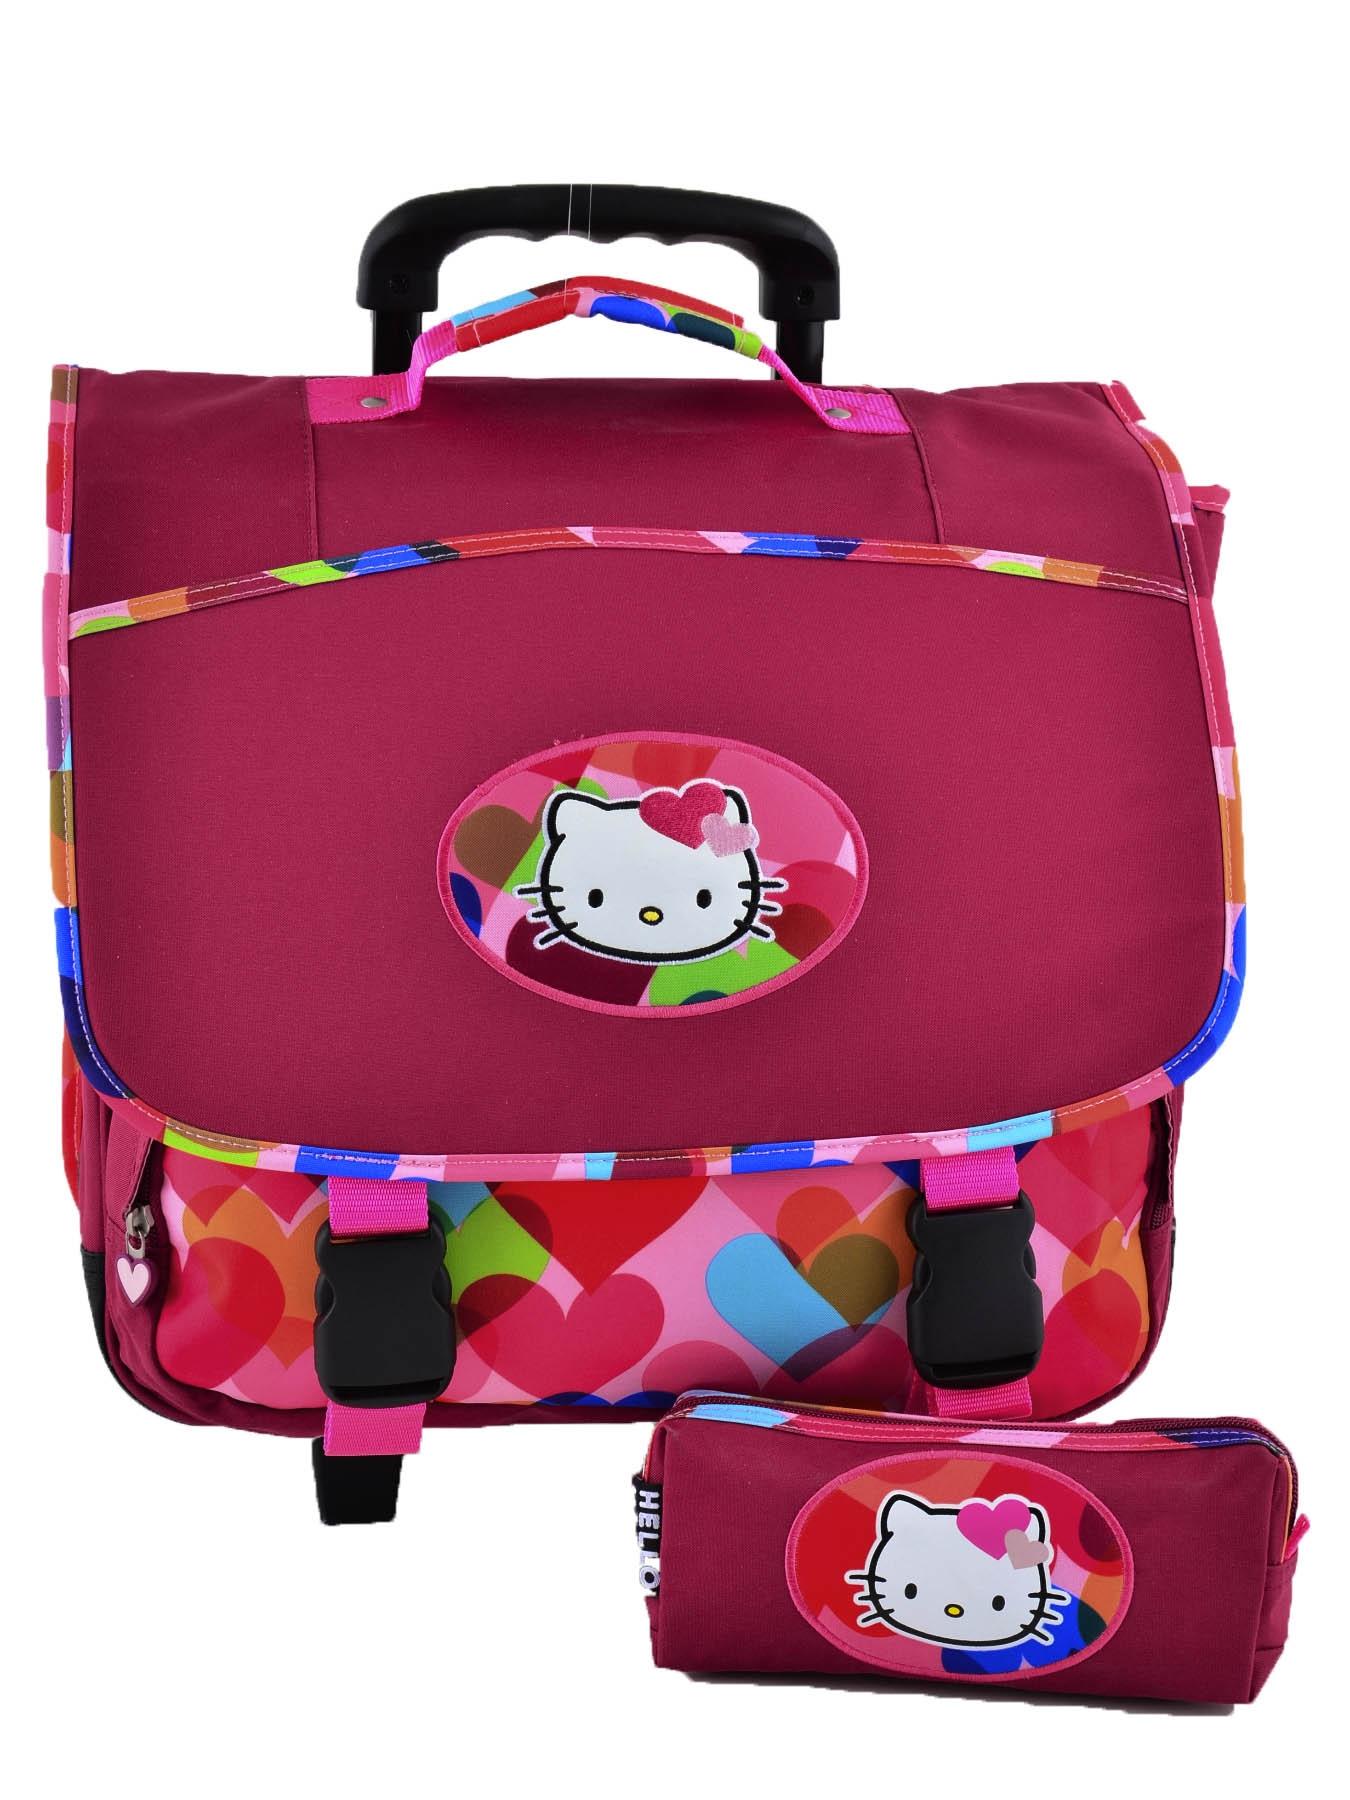 Школьный портфель на колесах Hello Kitty арт. HPS23070R, - фото 1